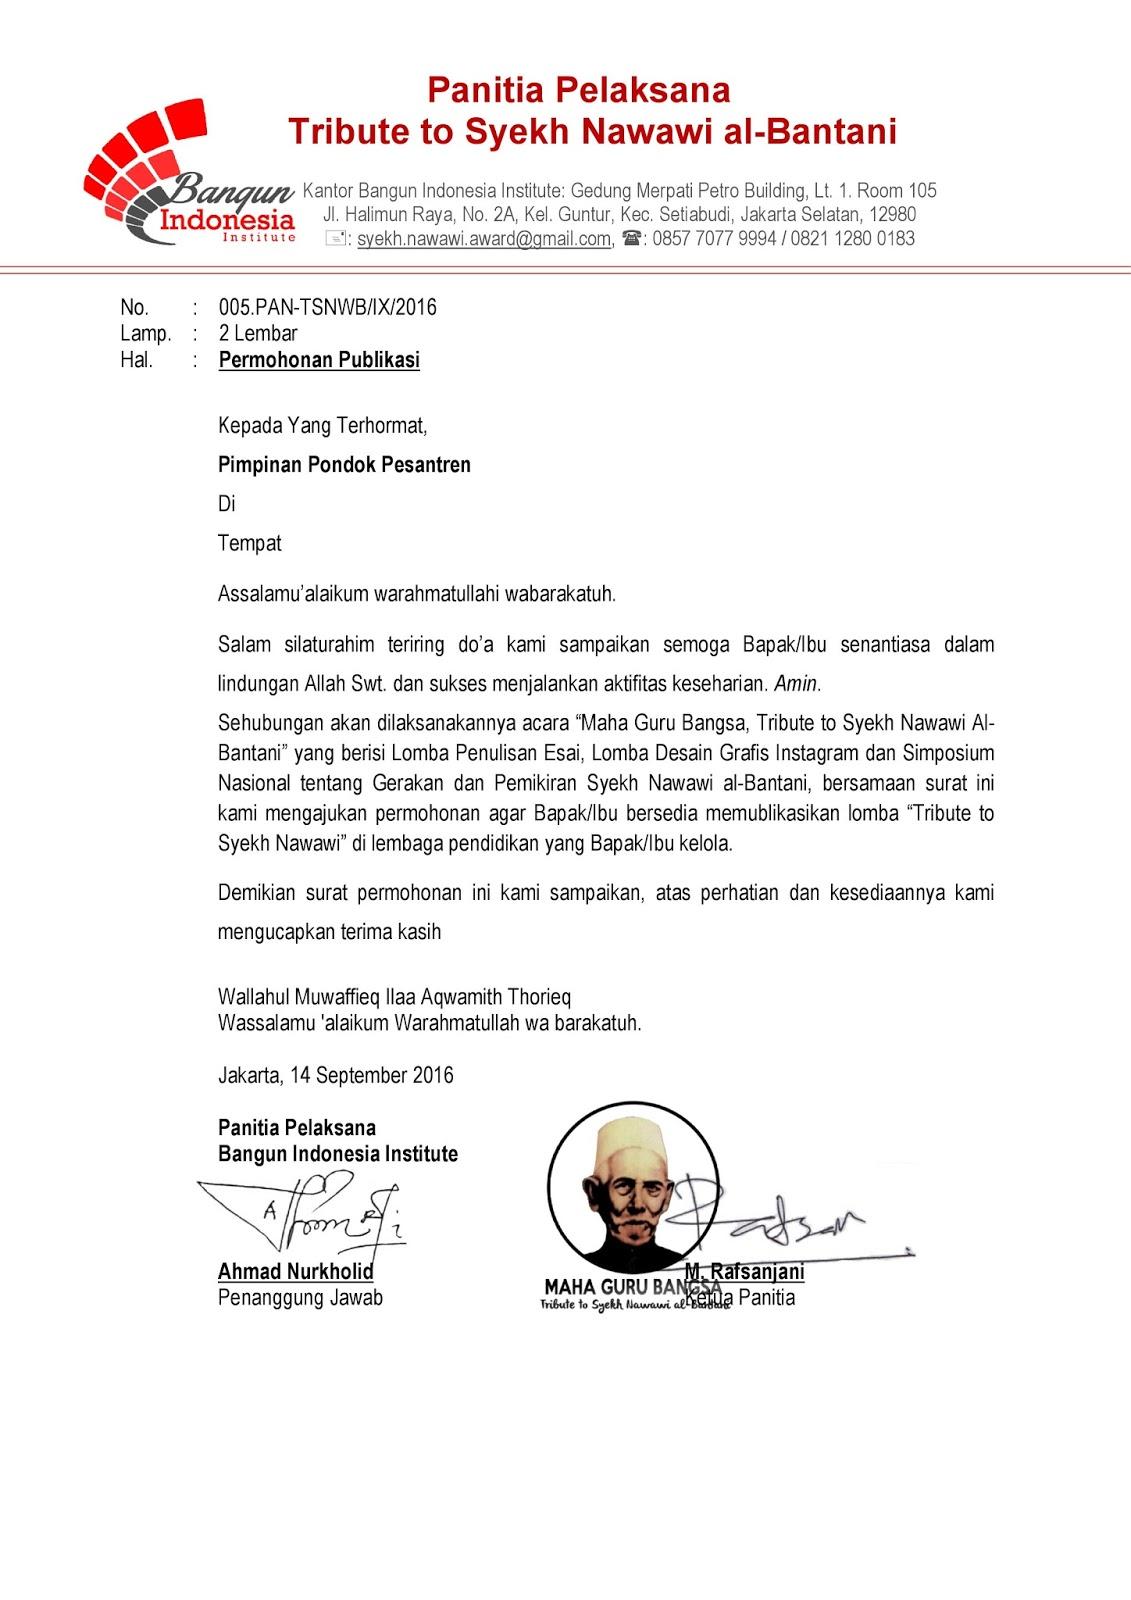 Contoh Surat Permohonan Publikasi Acara Brankas Arsip